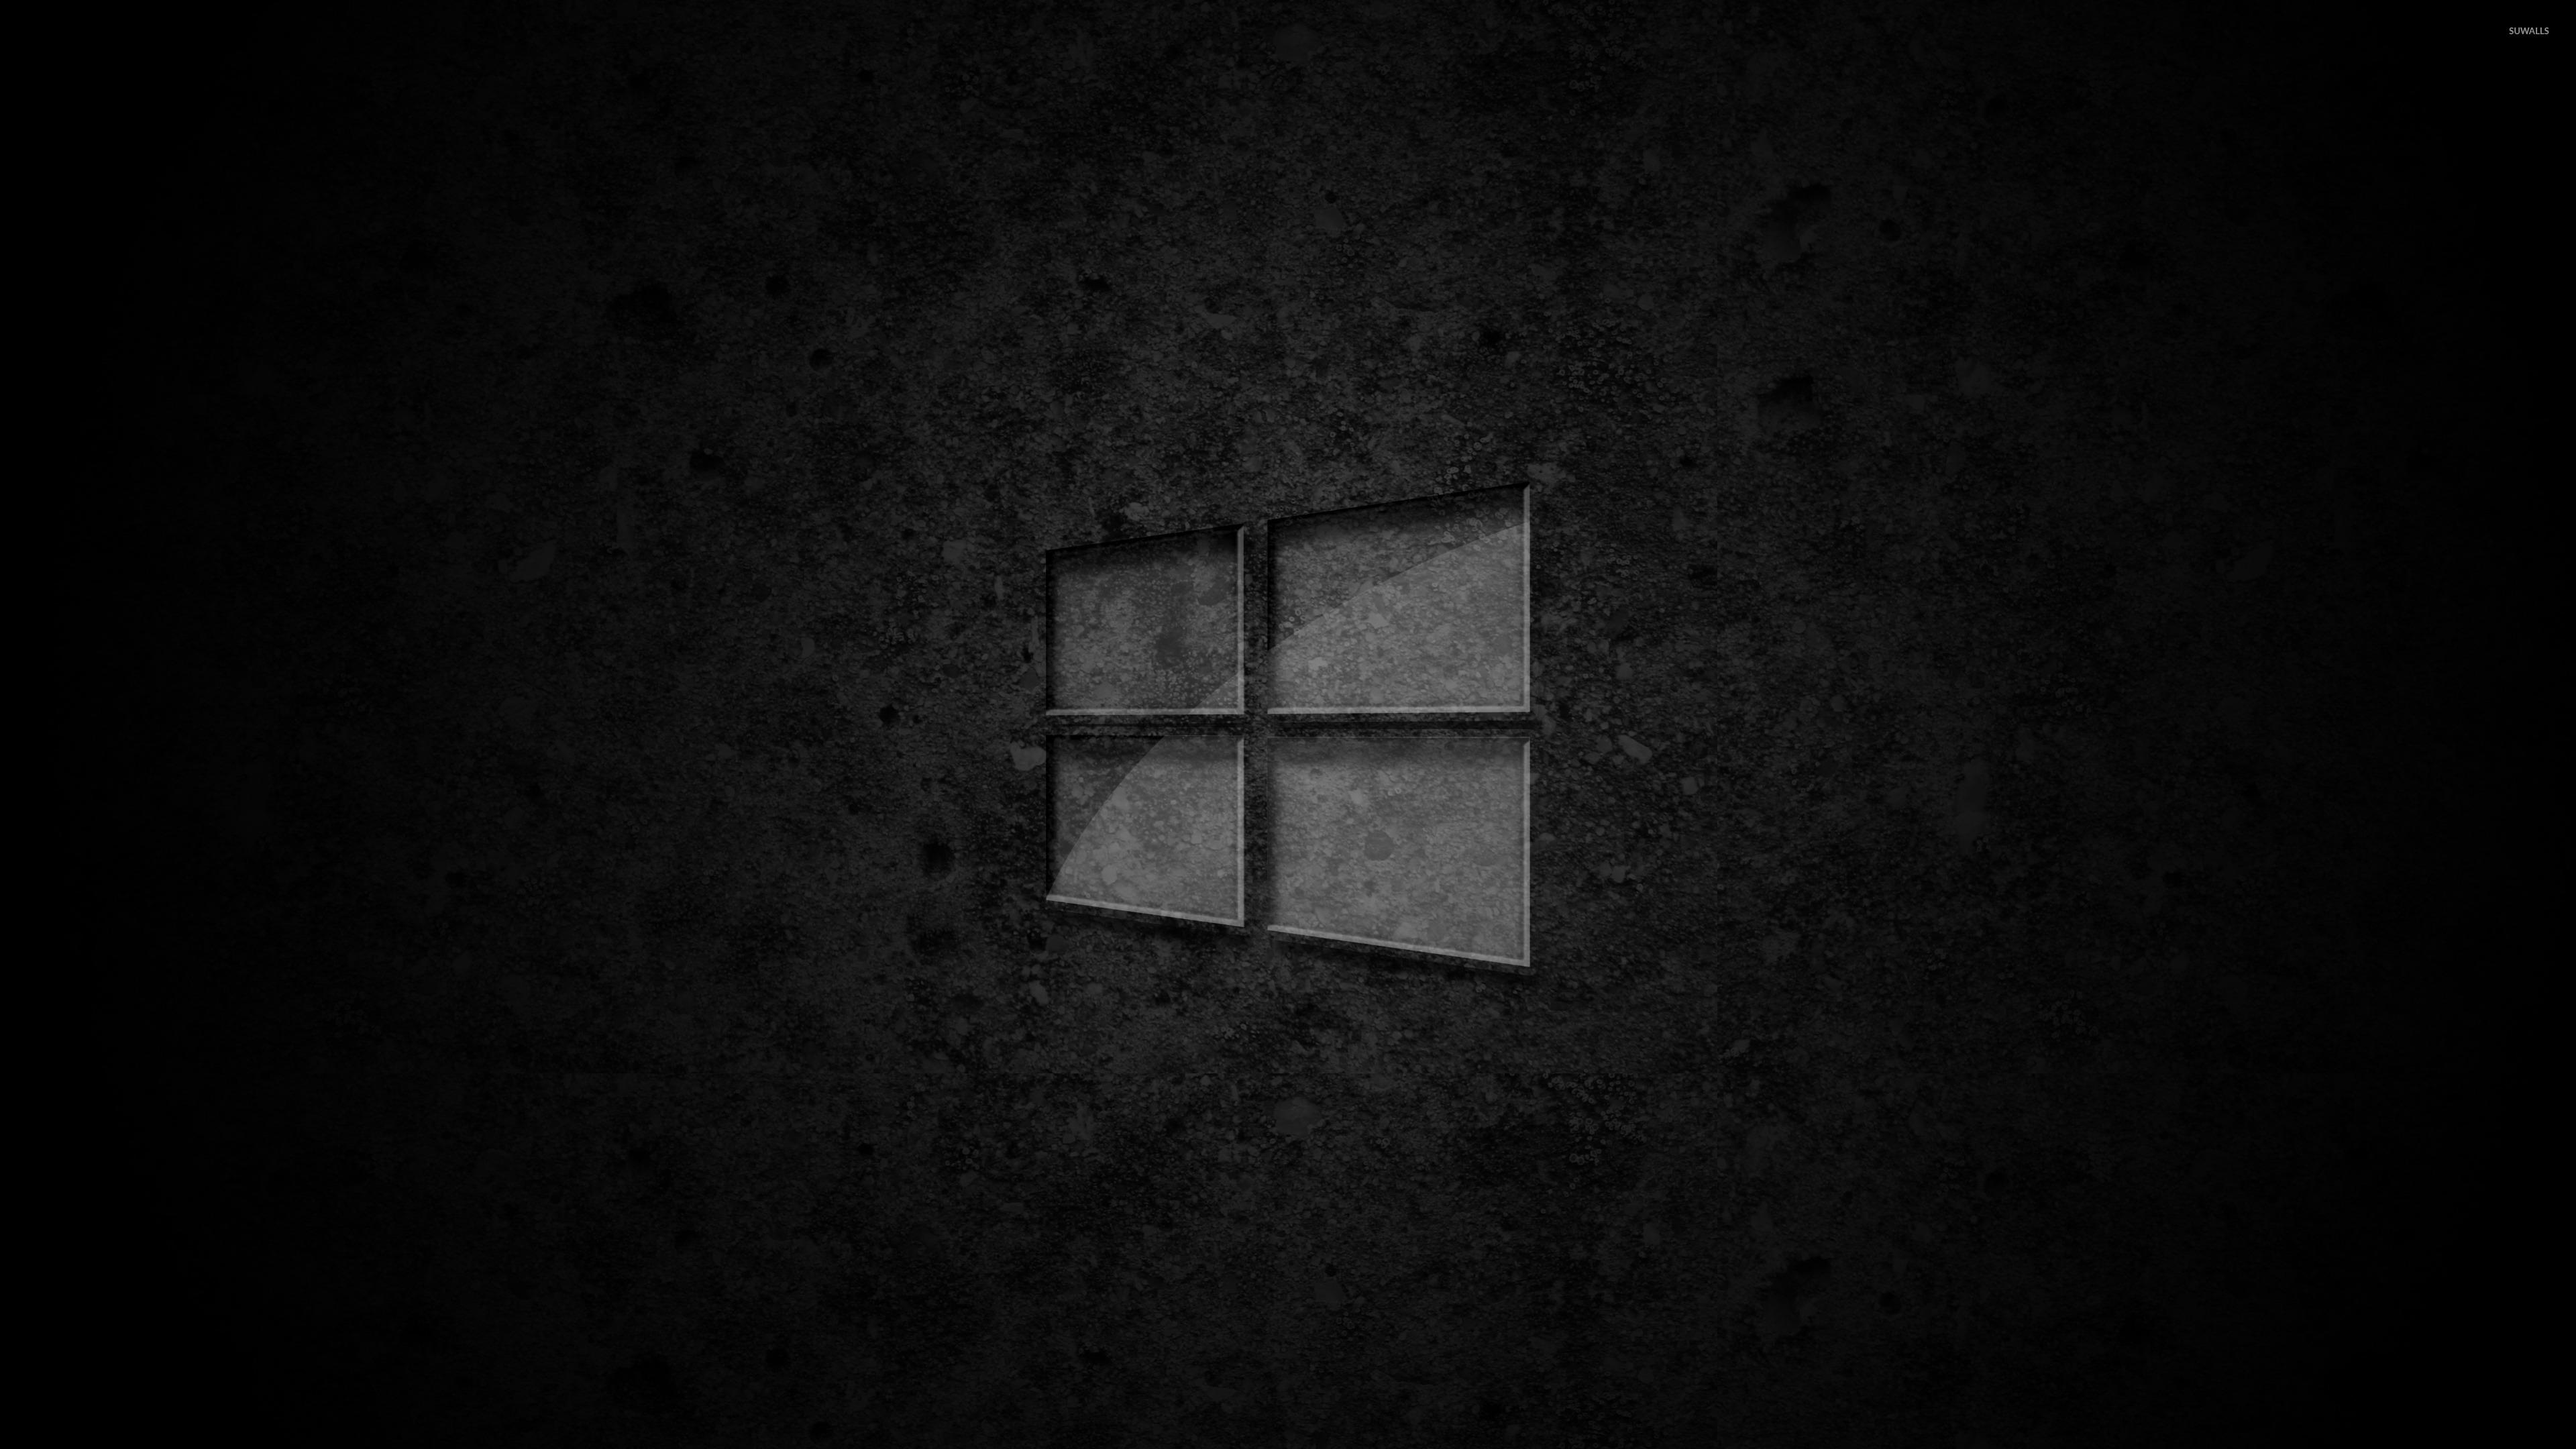 Glass Windows 10 Wallpaper : Glass windows on concrete wallpaper computer